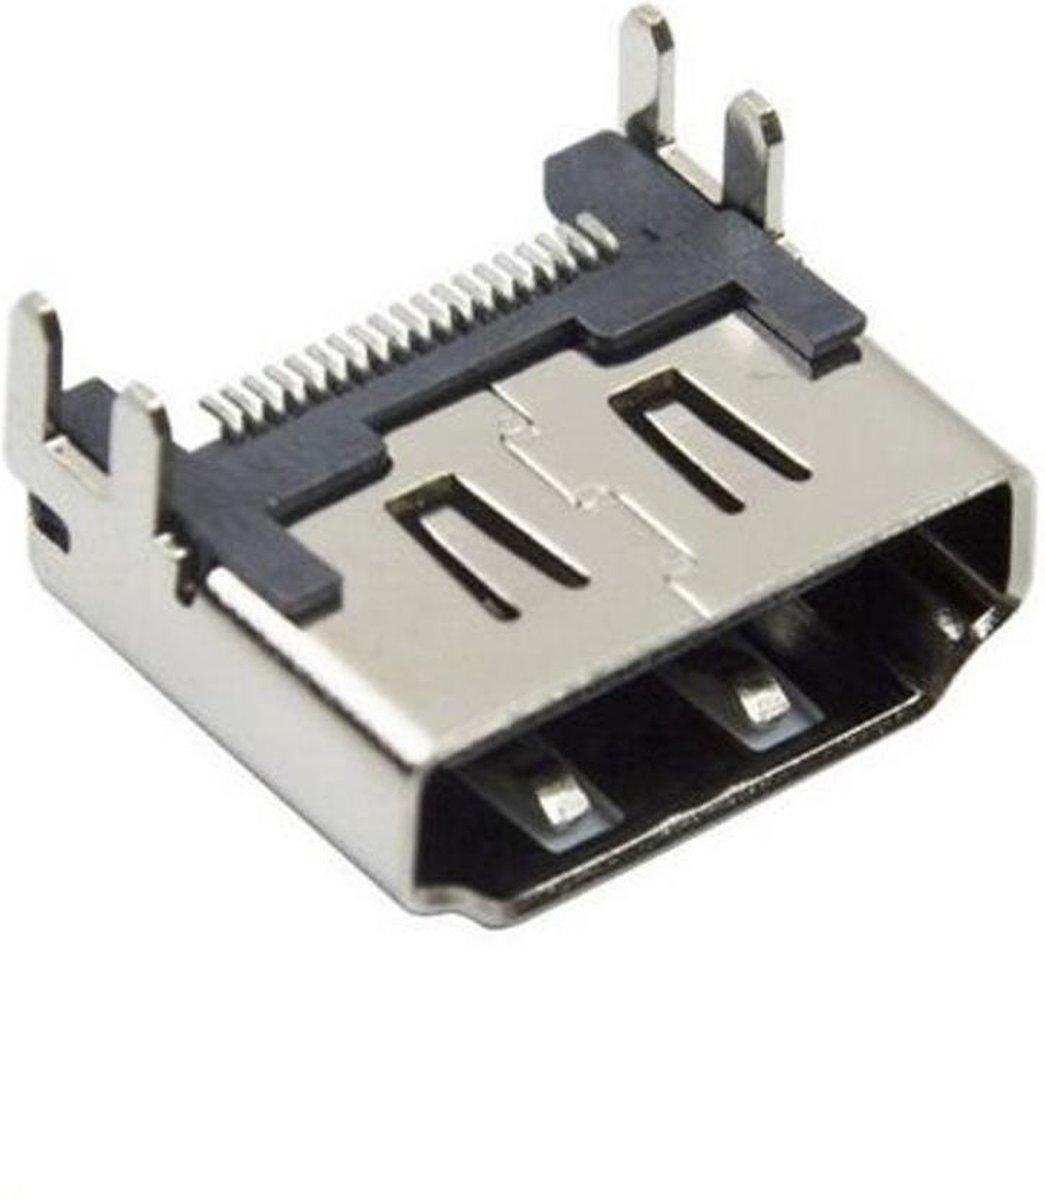 HDMI Female Connector Aansluiting Socket voor PlayStation PS4